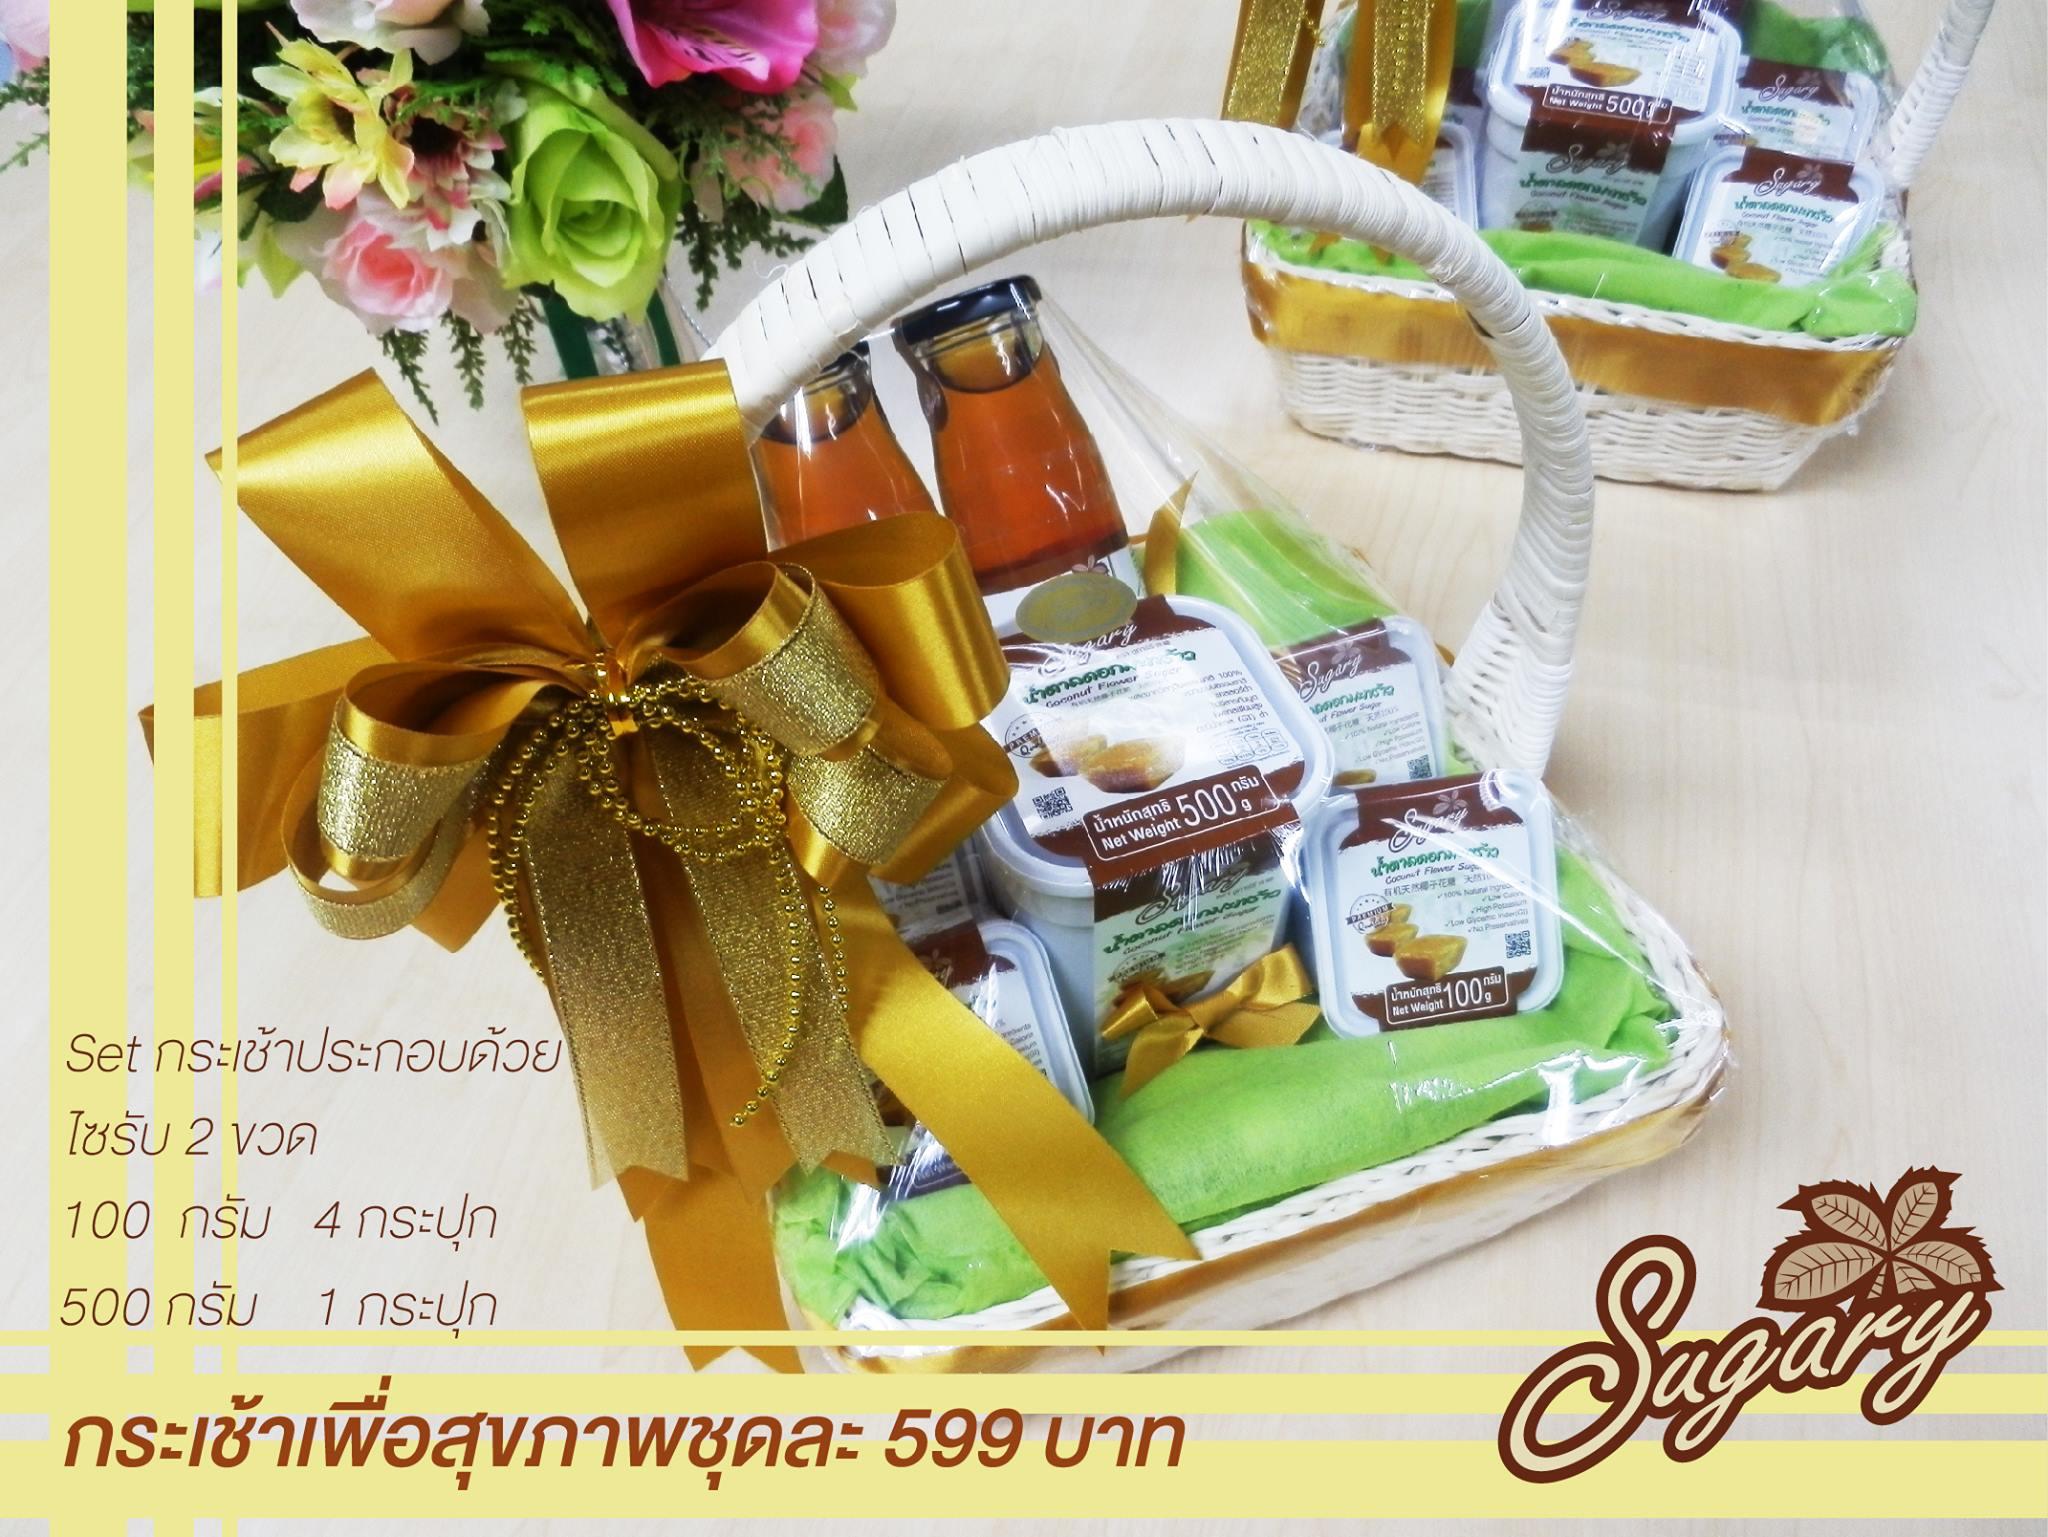 Sugary Gift Set & Basket